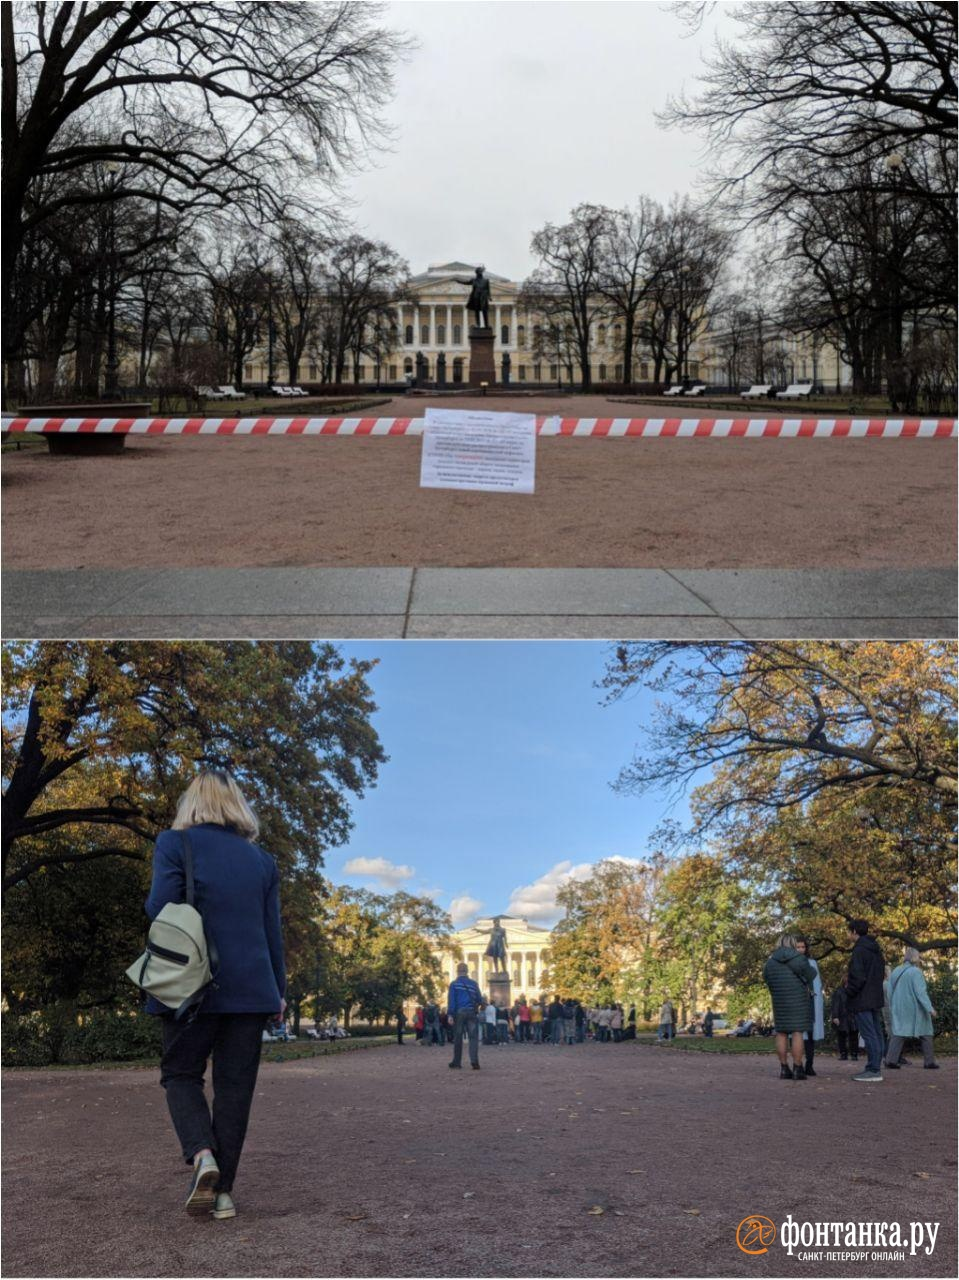 сверху: 6 апреля (+35 зараженных за сутки)&nbsp;<br>снизу: 10 октября (+500 зараженных за сутки)<br><br>автор фото Павел Каравашкин/«Фонтанка.ру»